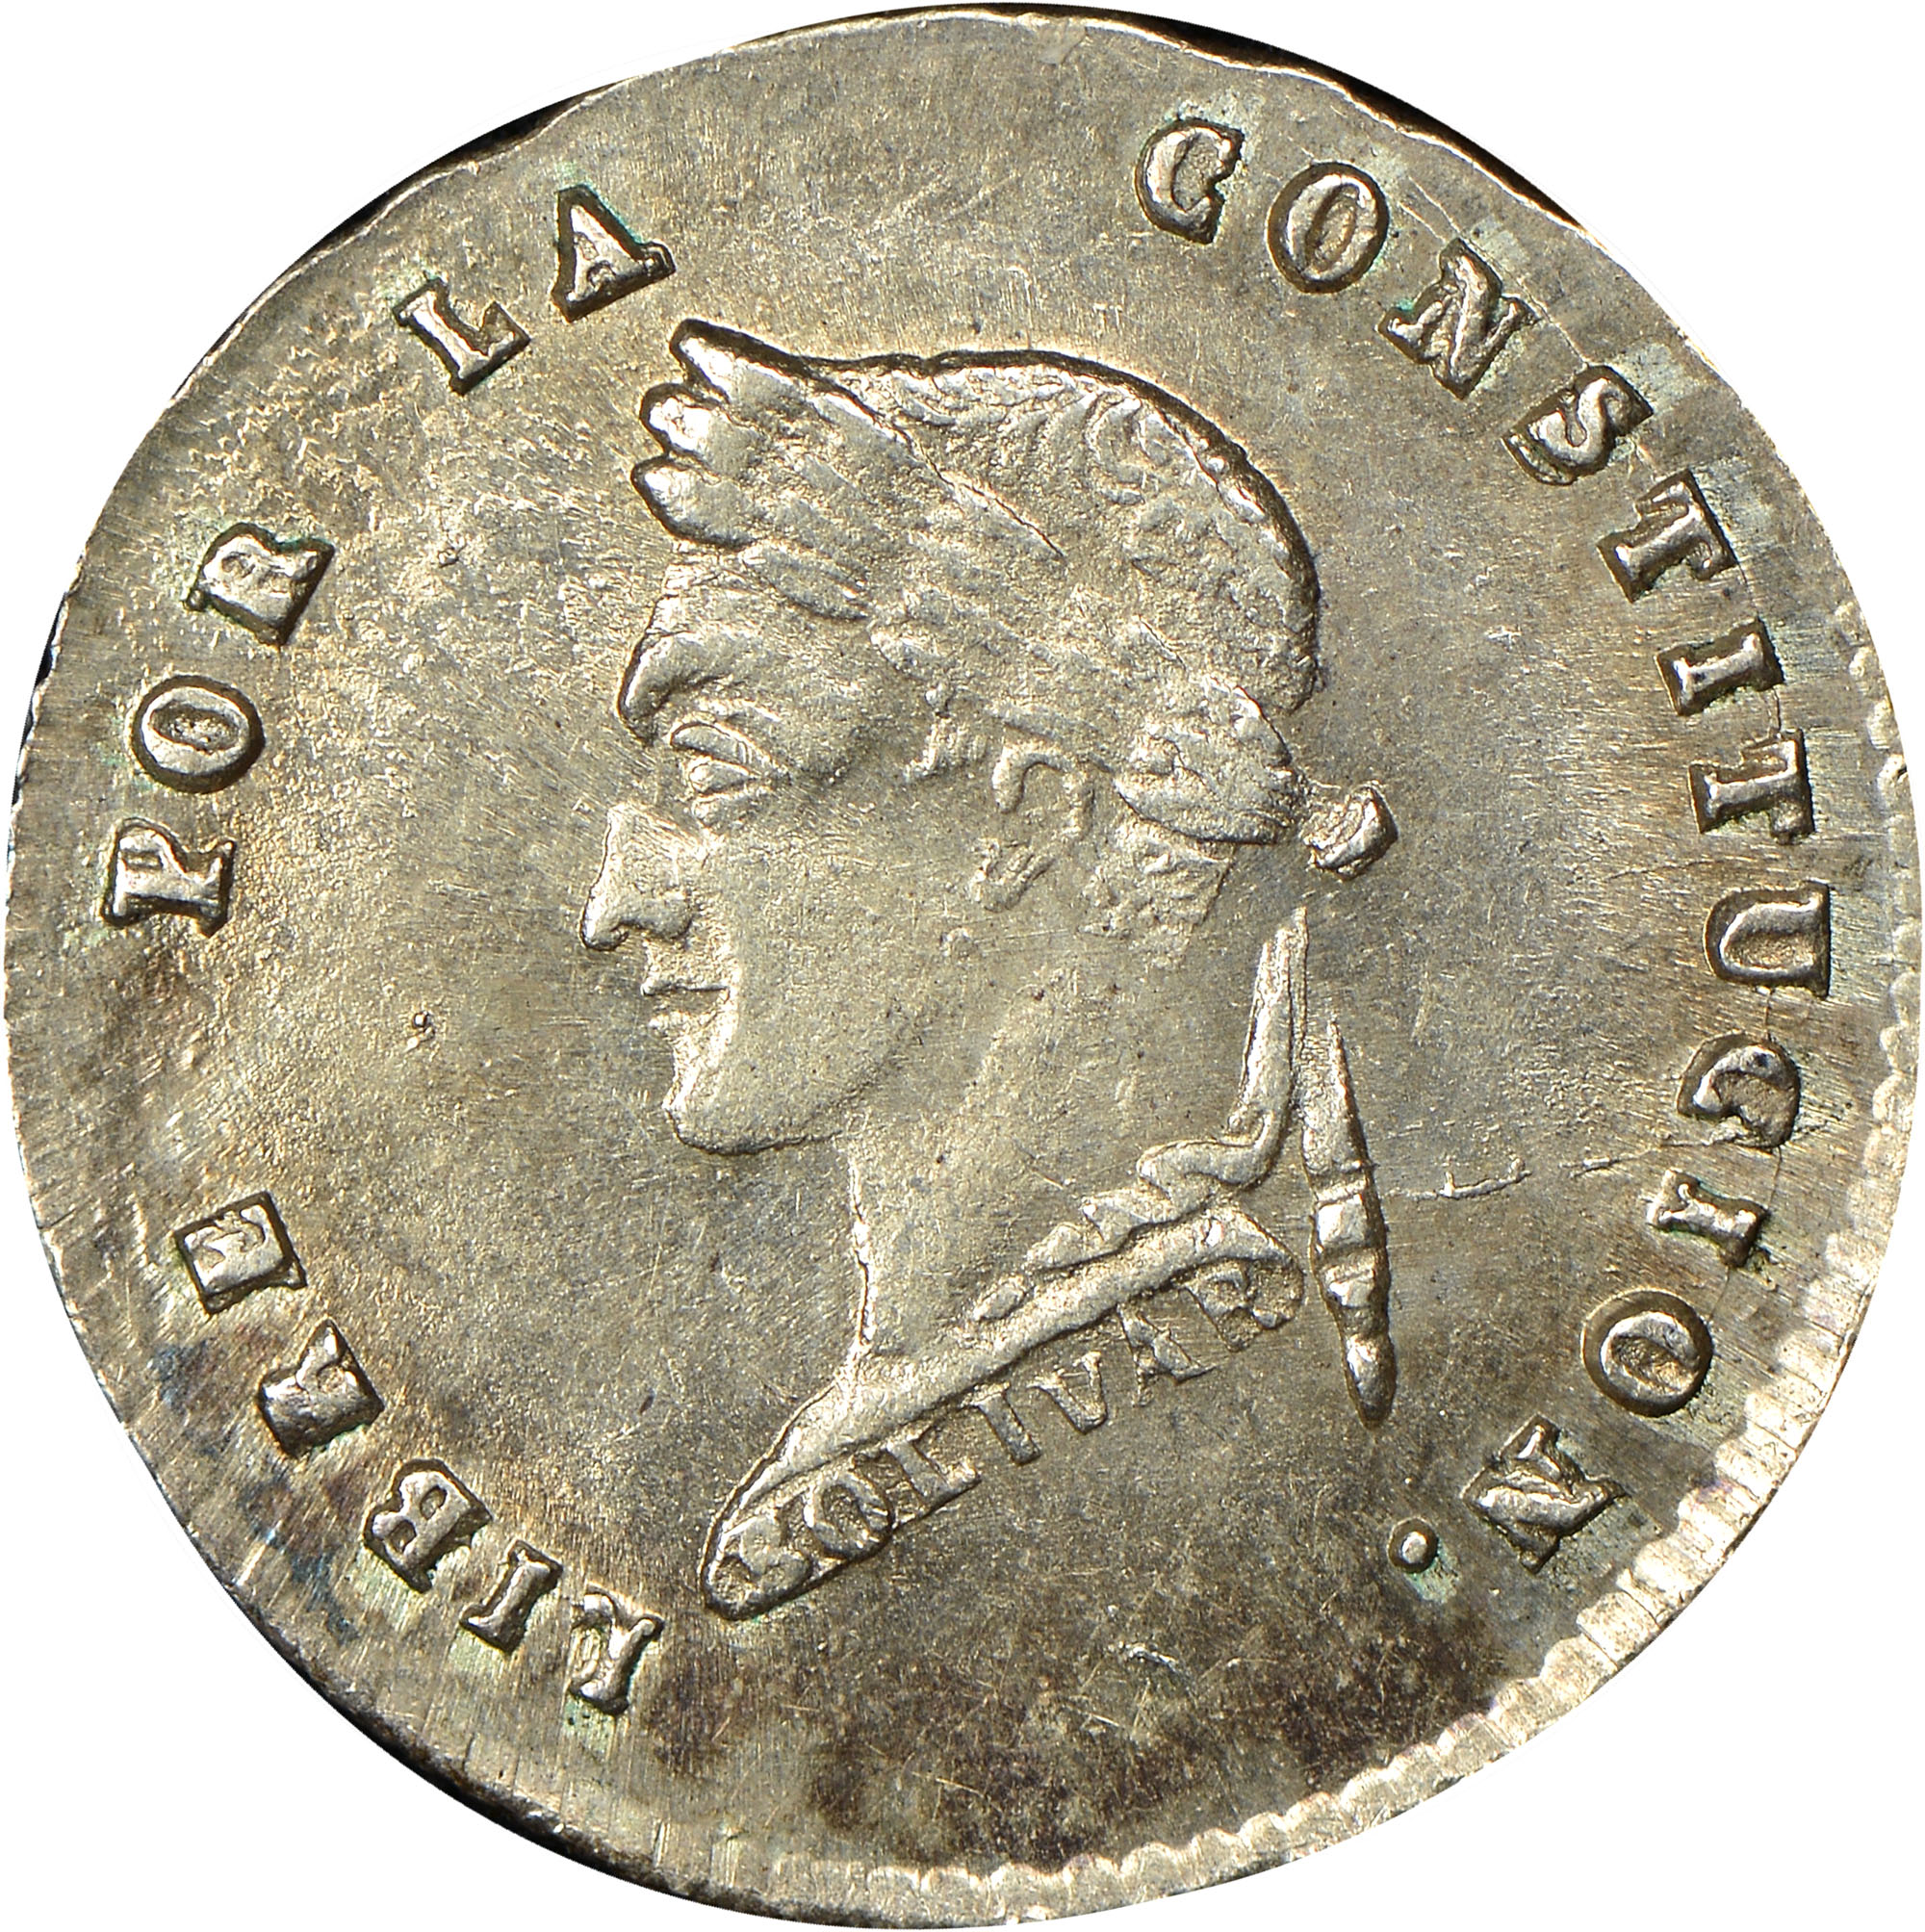 1856-1858/7 Bolivia 1/2 Sol reverse